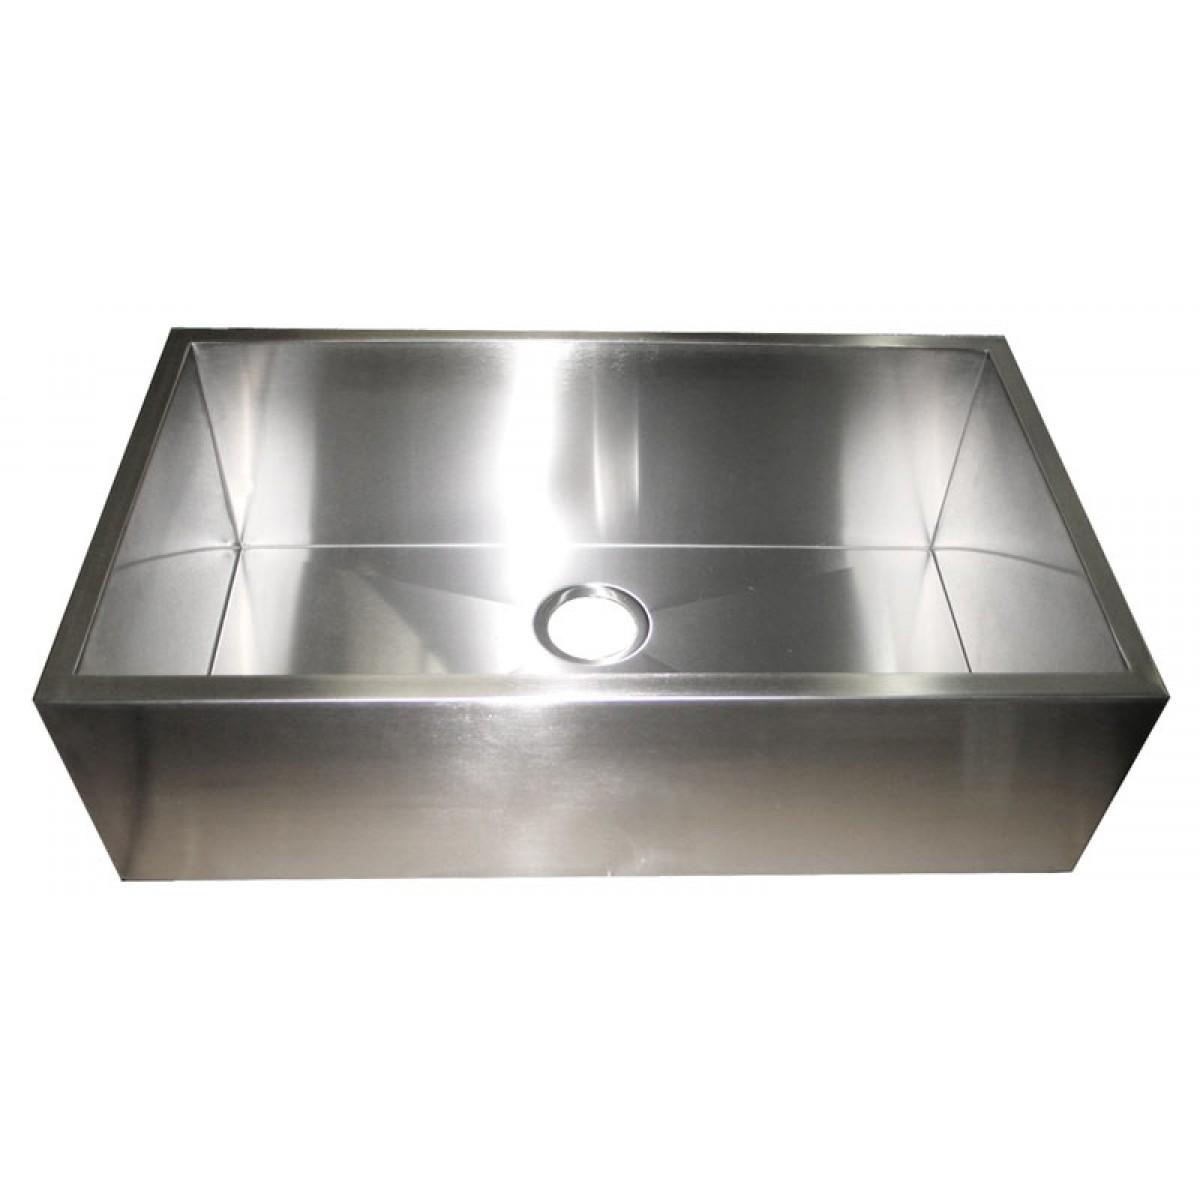 Stainless Steel Apron Kitchen Sink